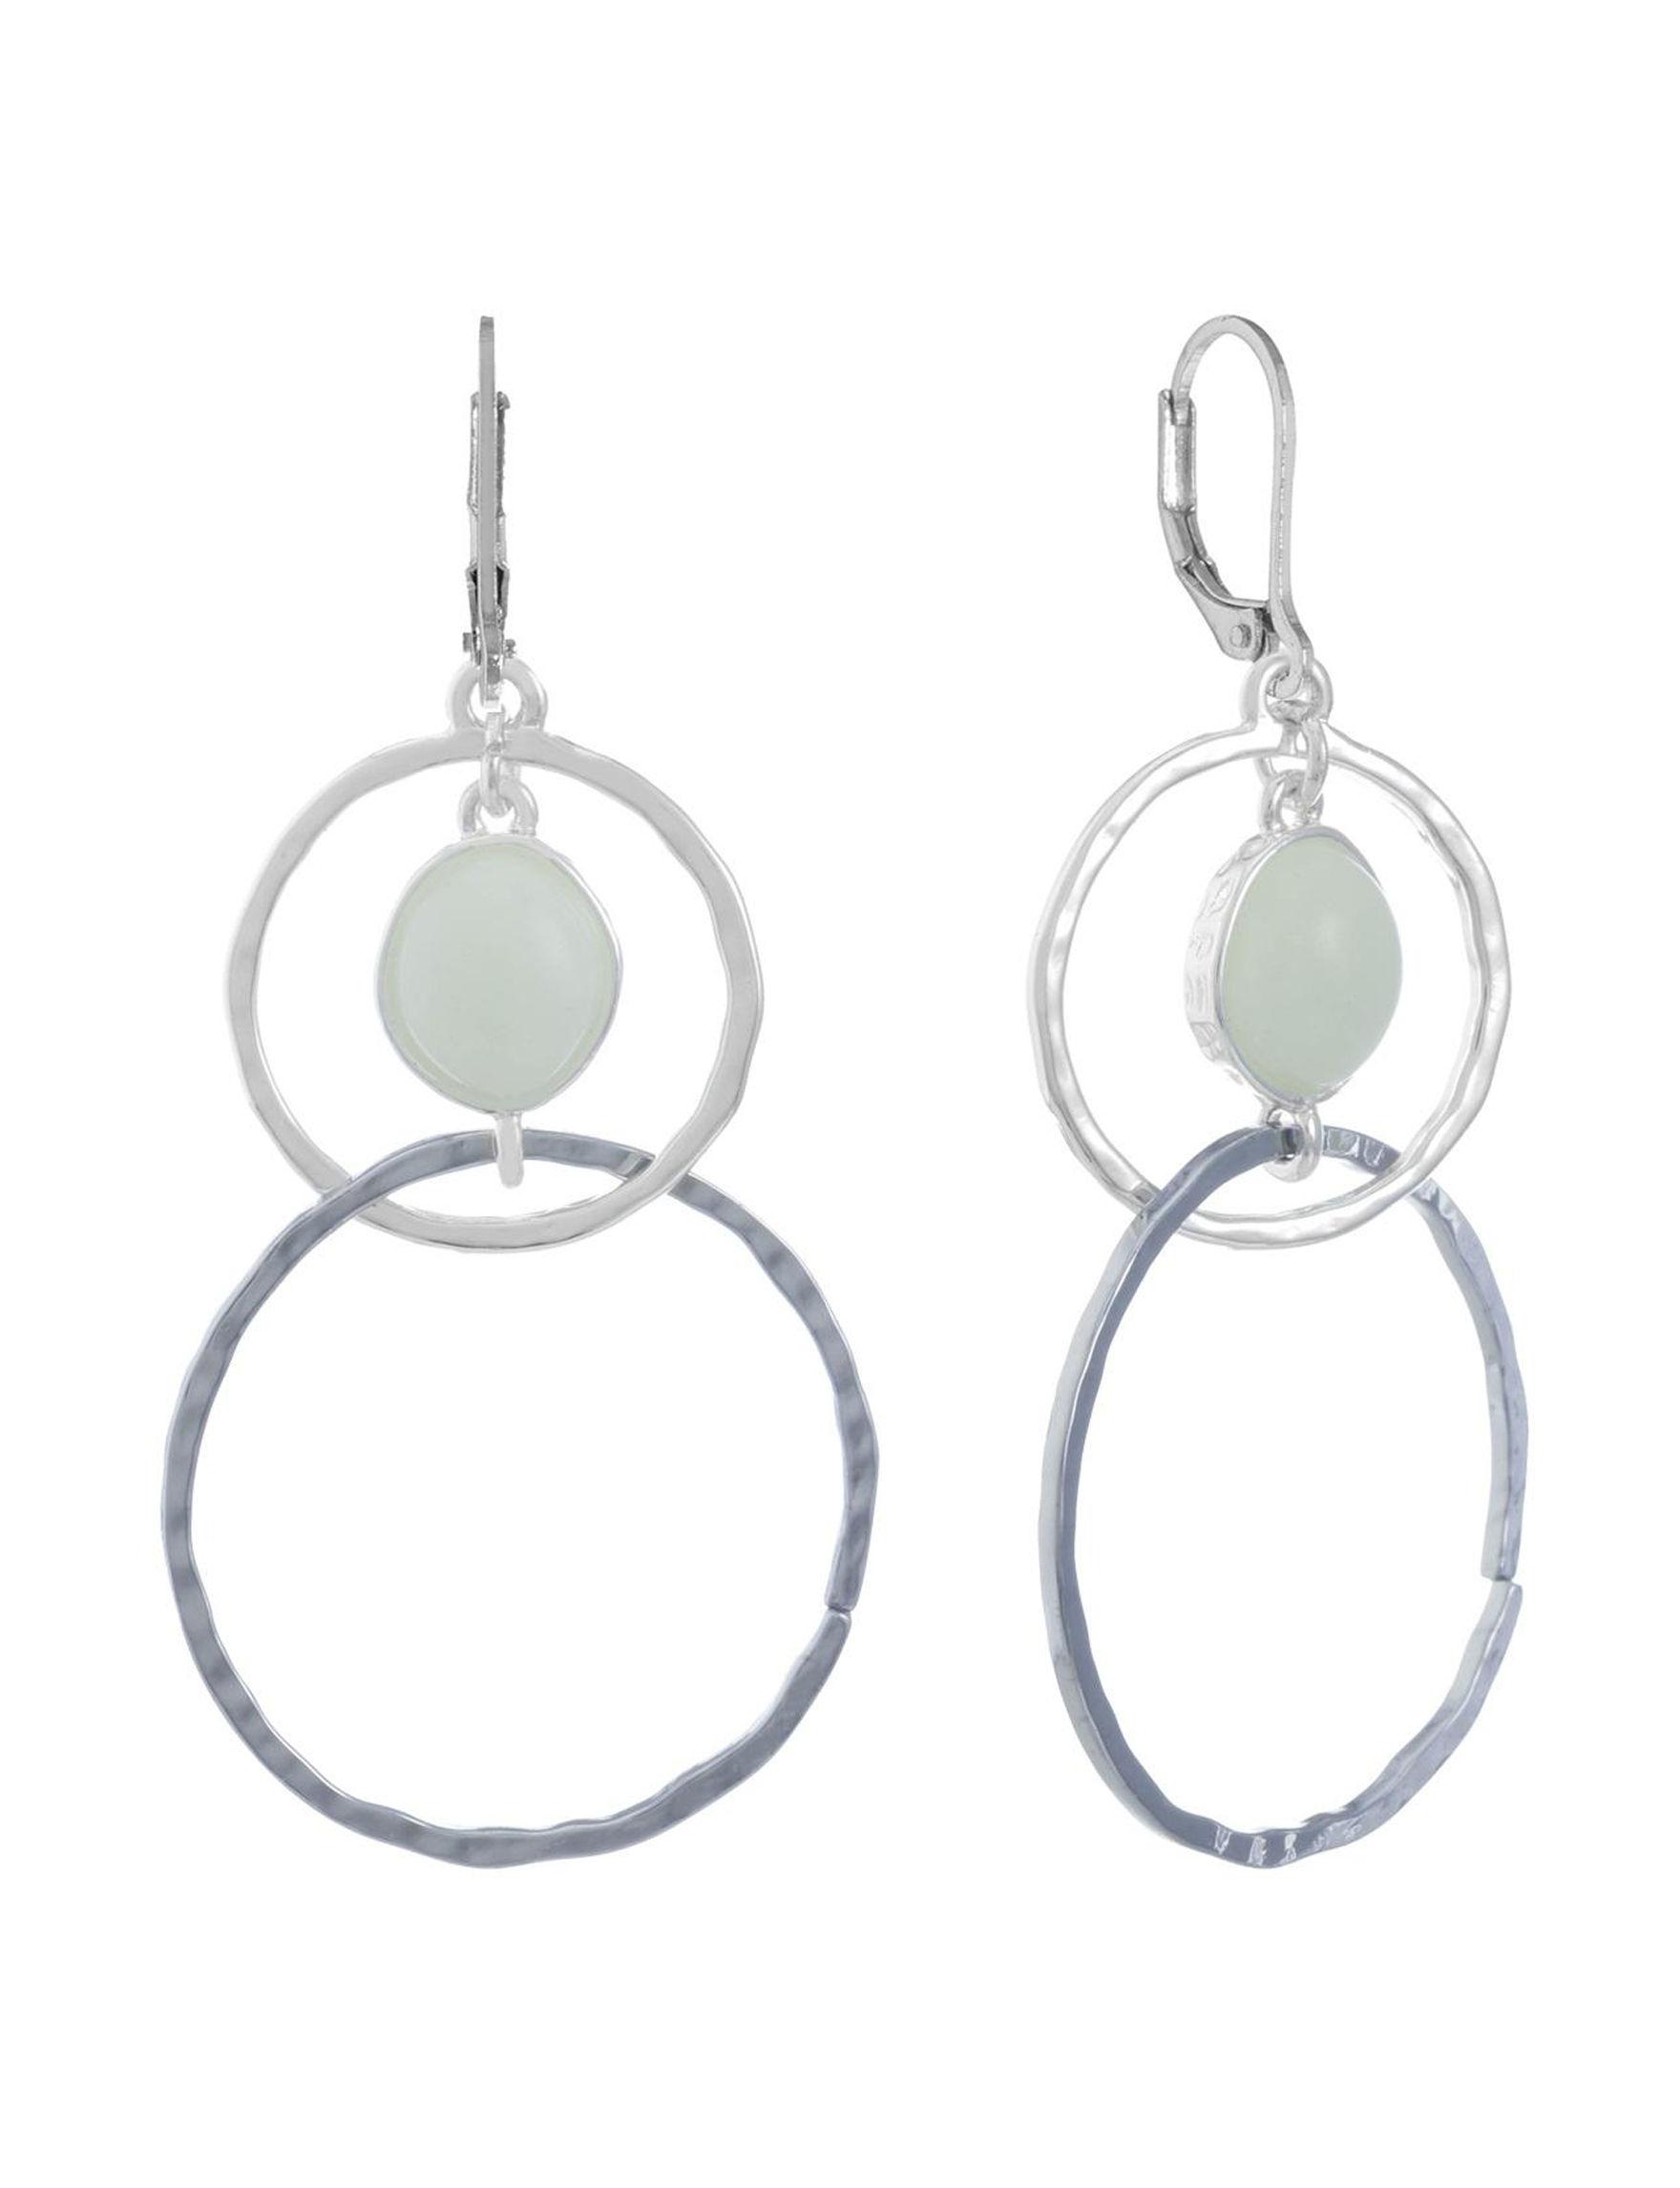 Chaps Silver / Green Stone Drops Earrings Fashion Jewelry